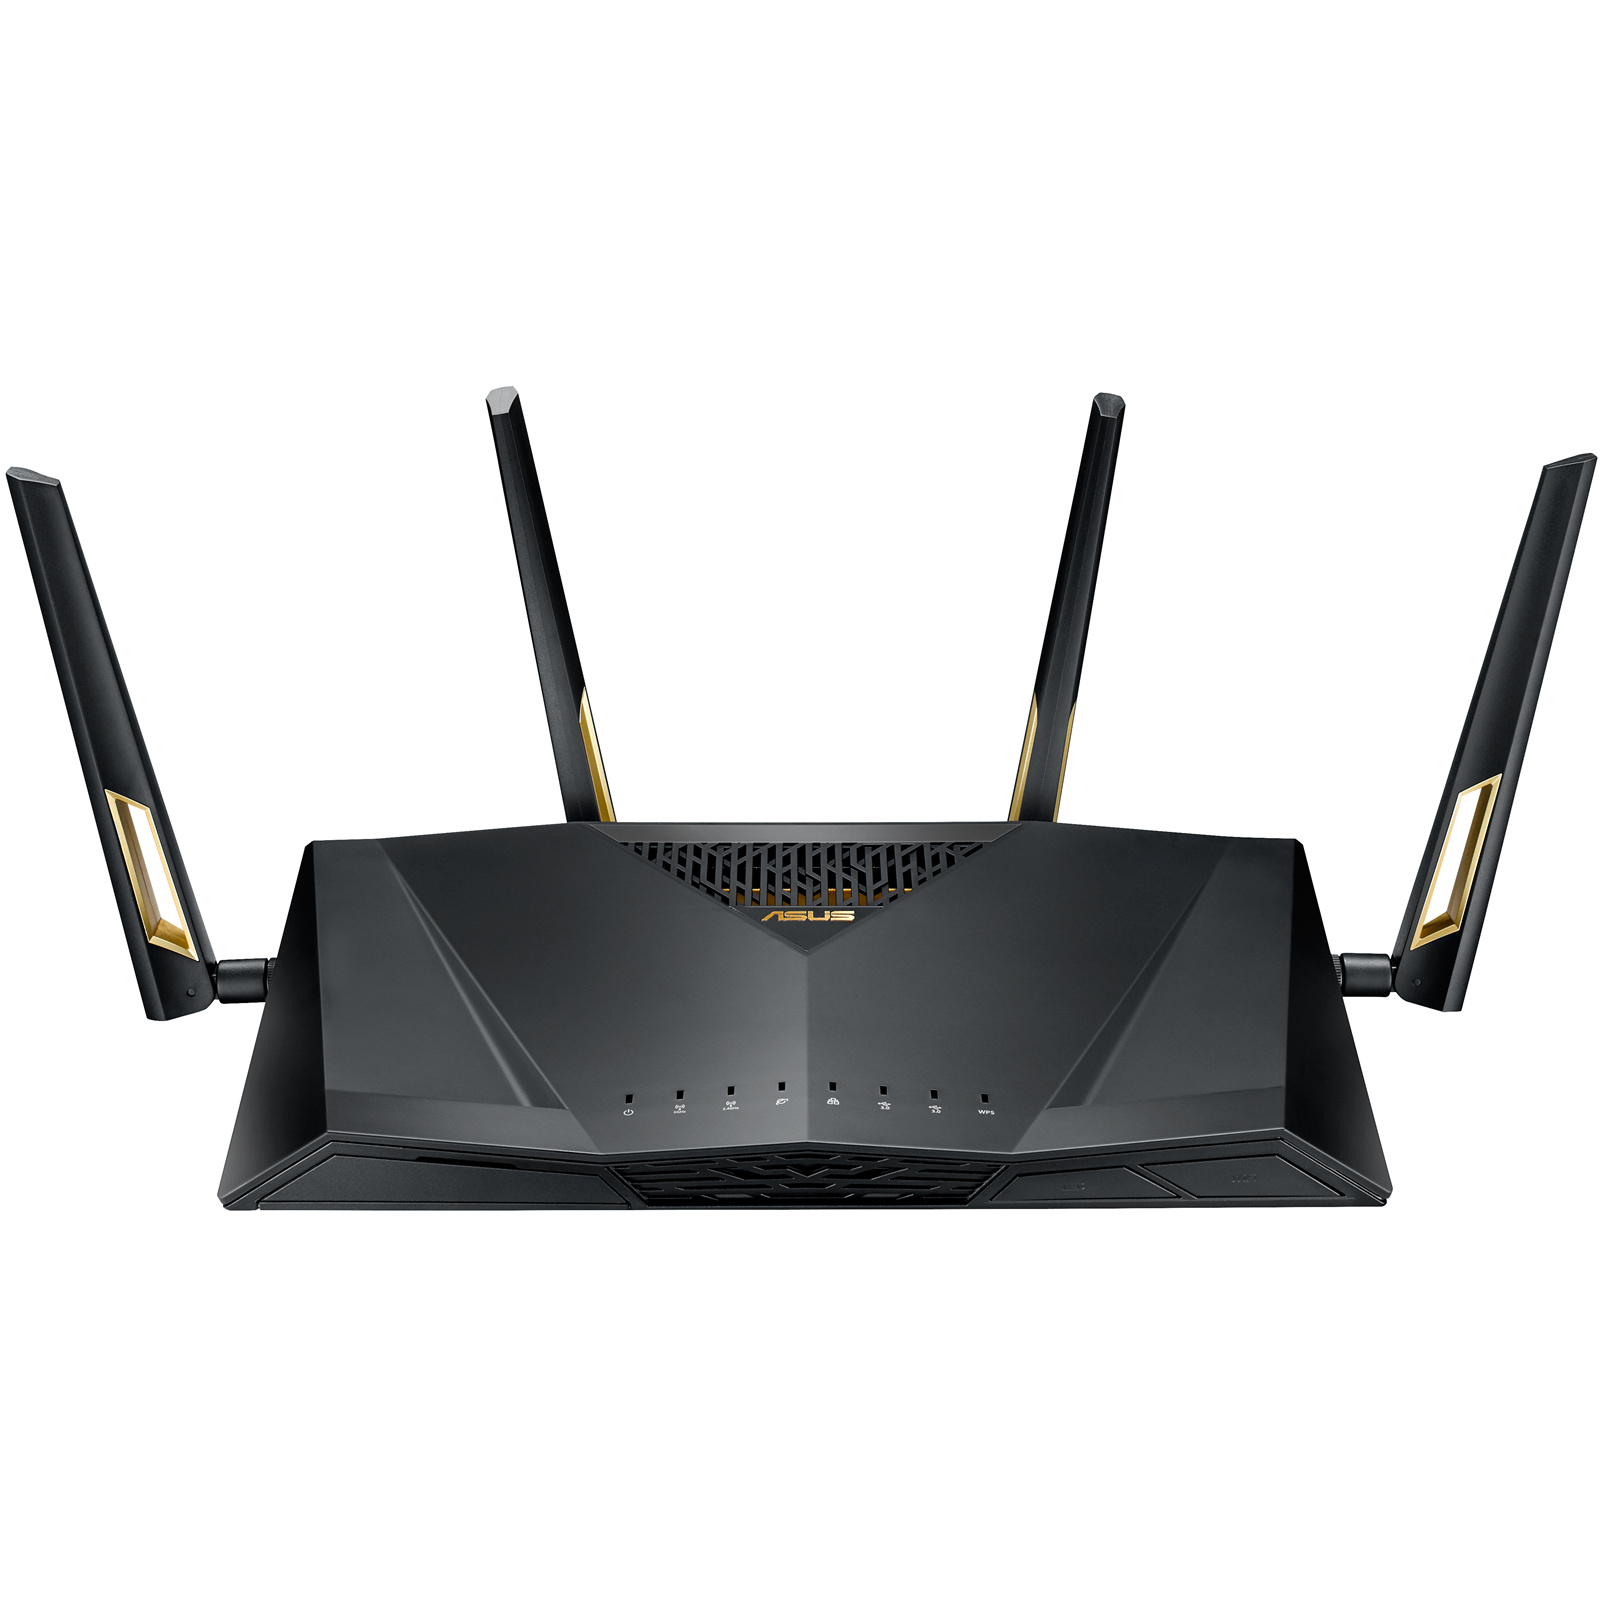 Buy the ASUS RT-AX88U MU-MIMO Gigabit Wi-Fi Gaming Router